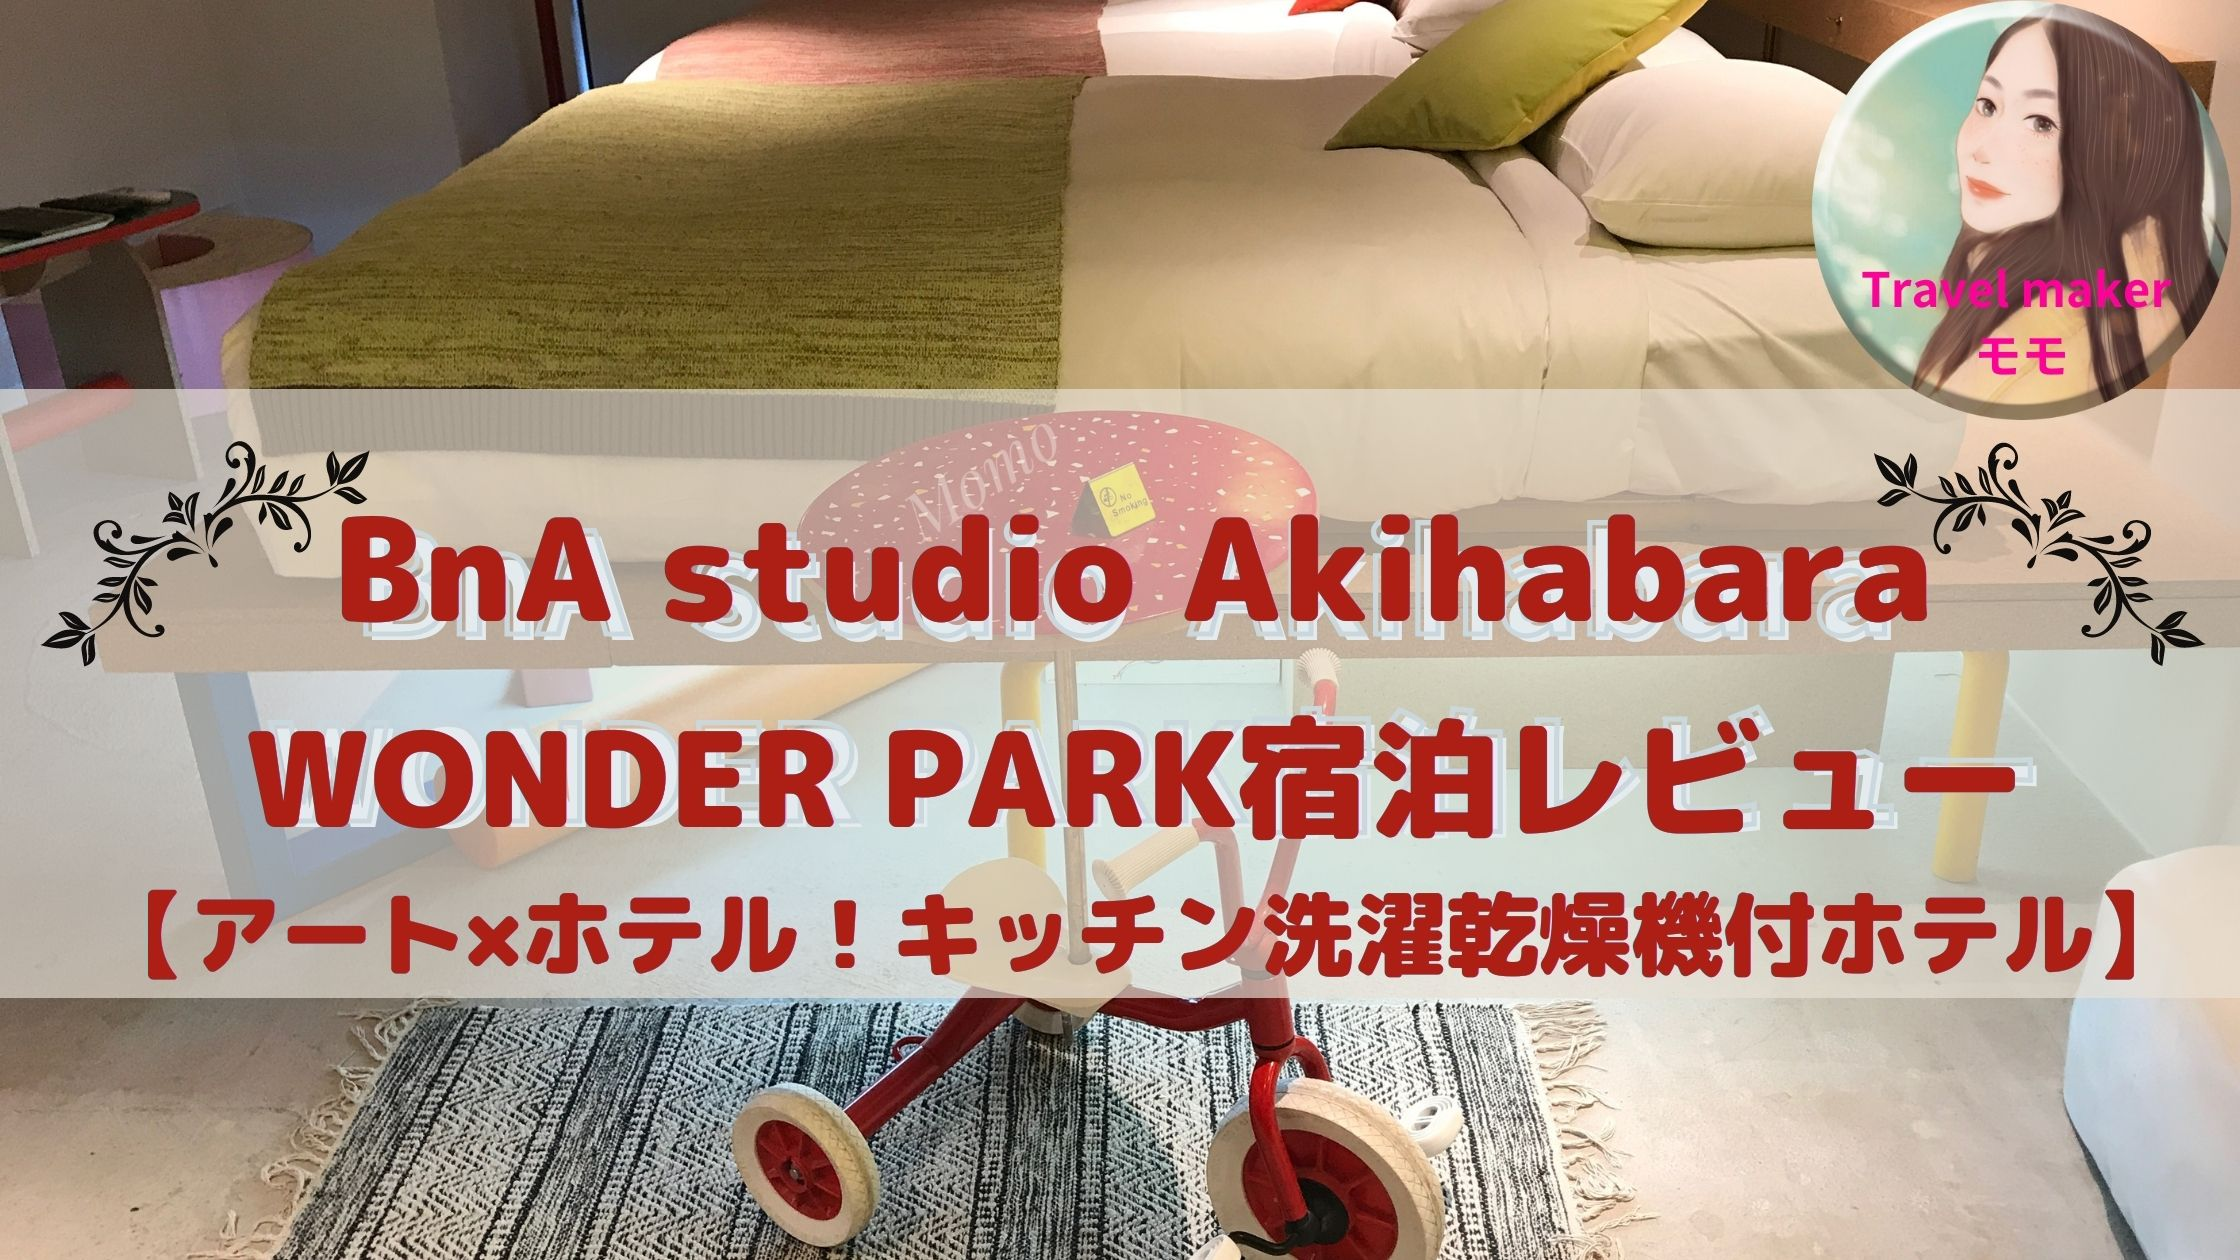 BnA studio Akihabara 宿泊記 ブログ